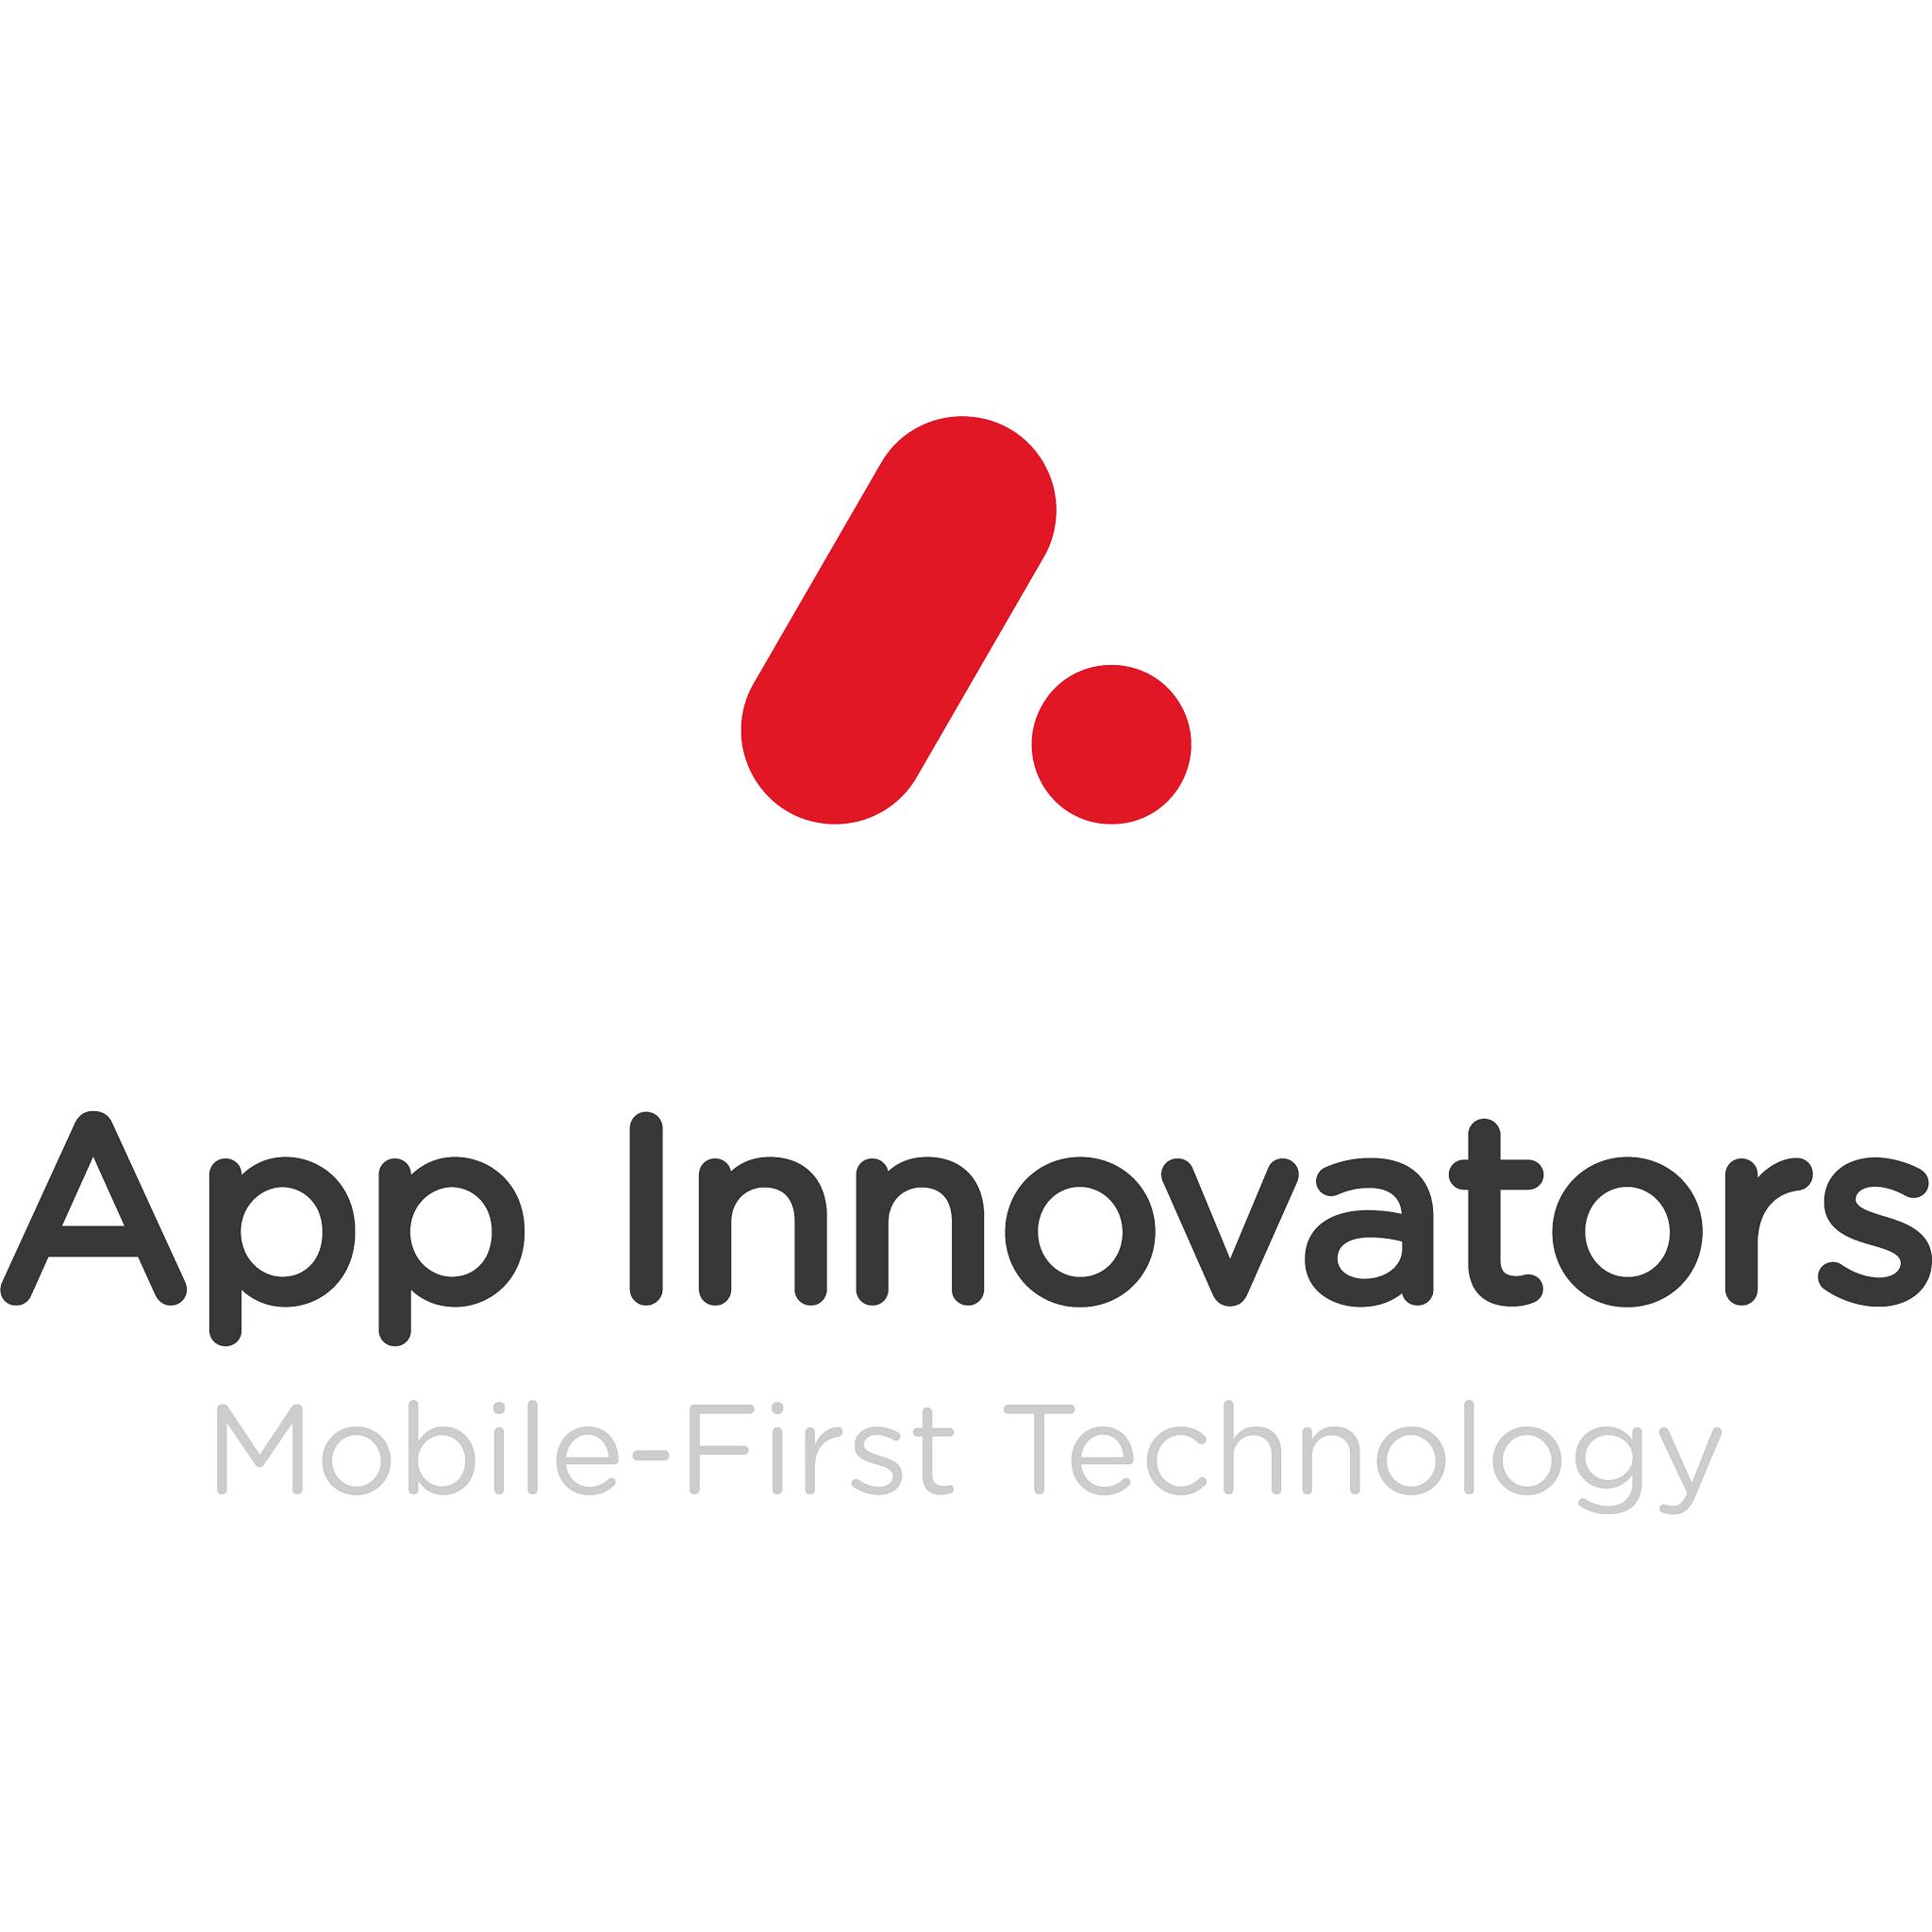 App Innovators